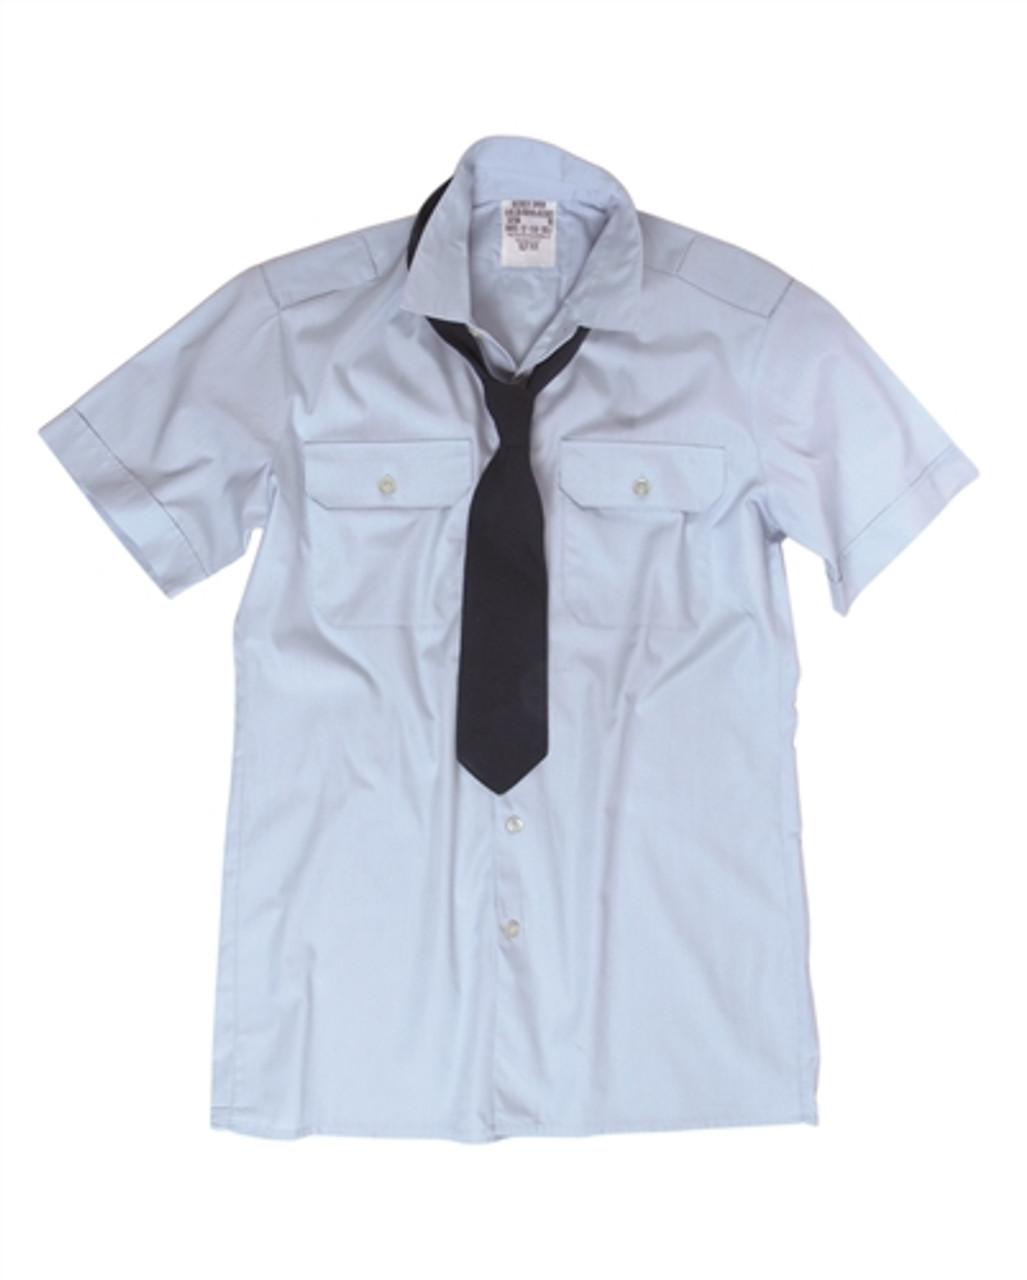 German Blue Short Sleeve Service Shirt from Hessen Surplus